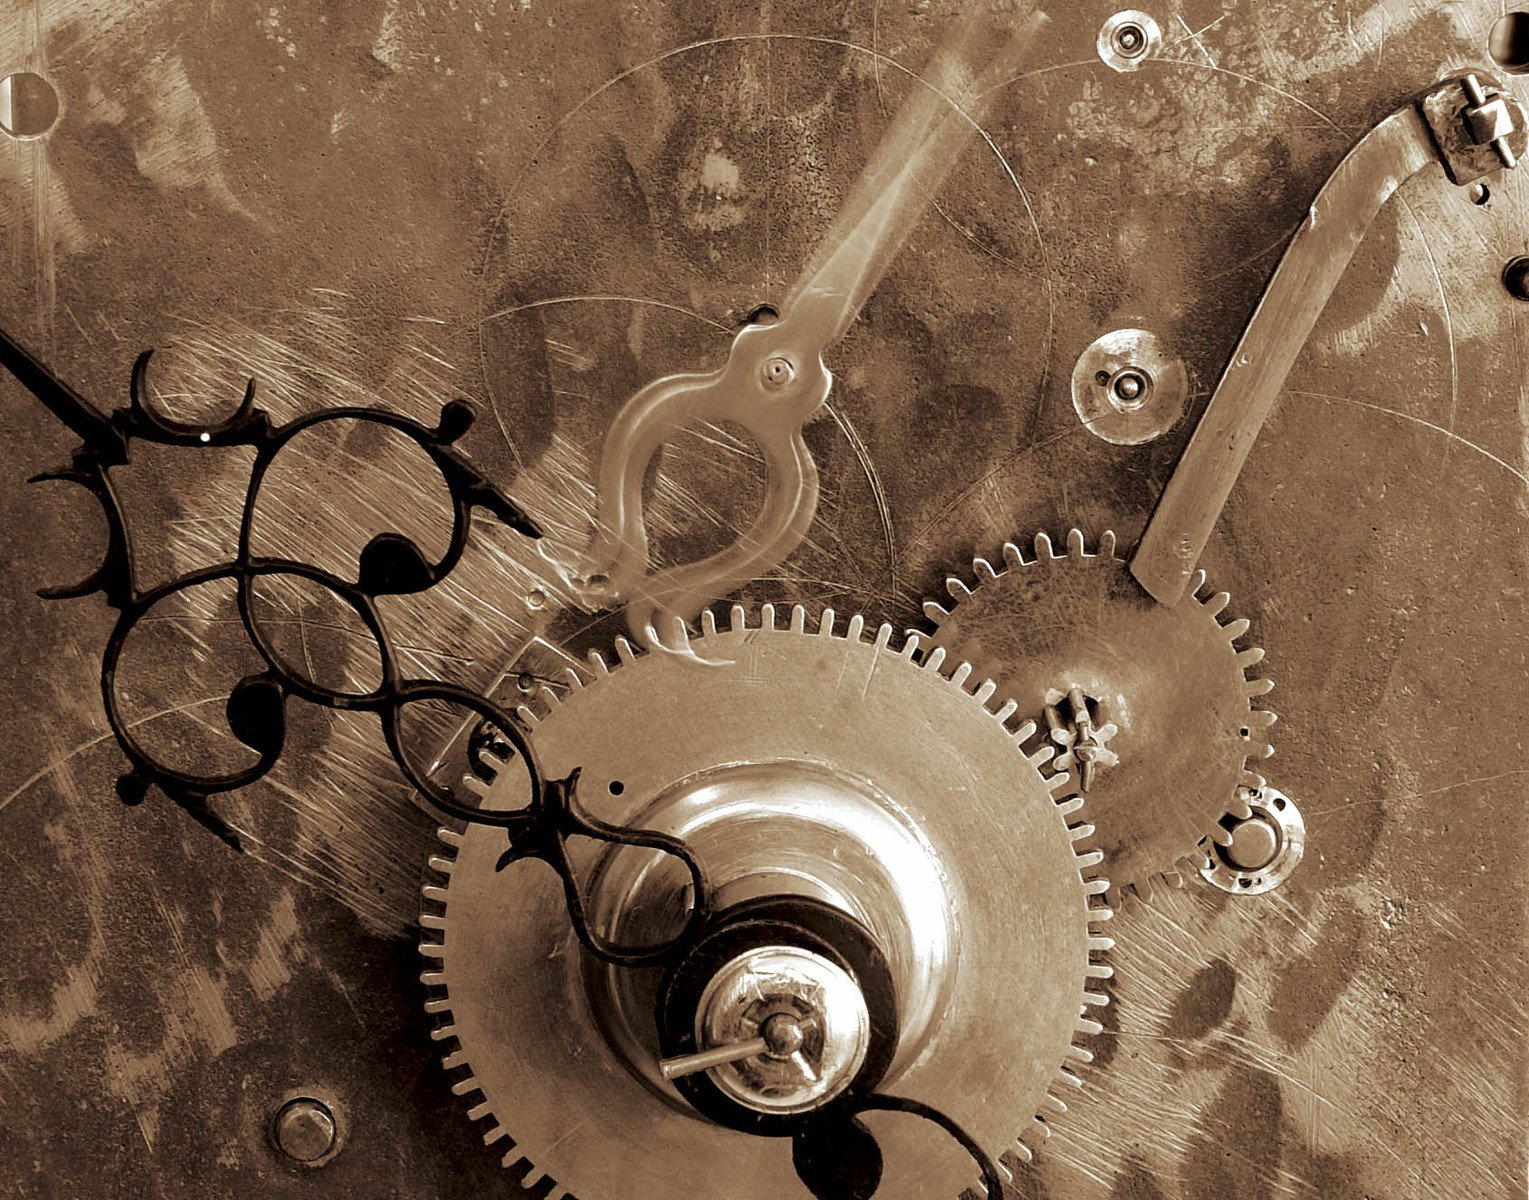 The clockwork